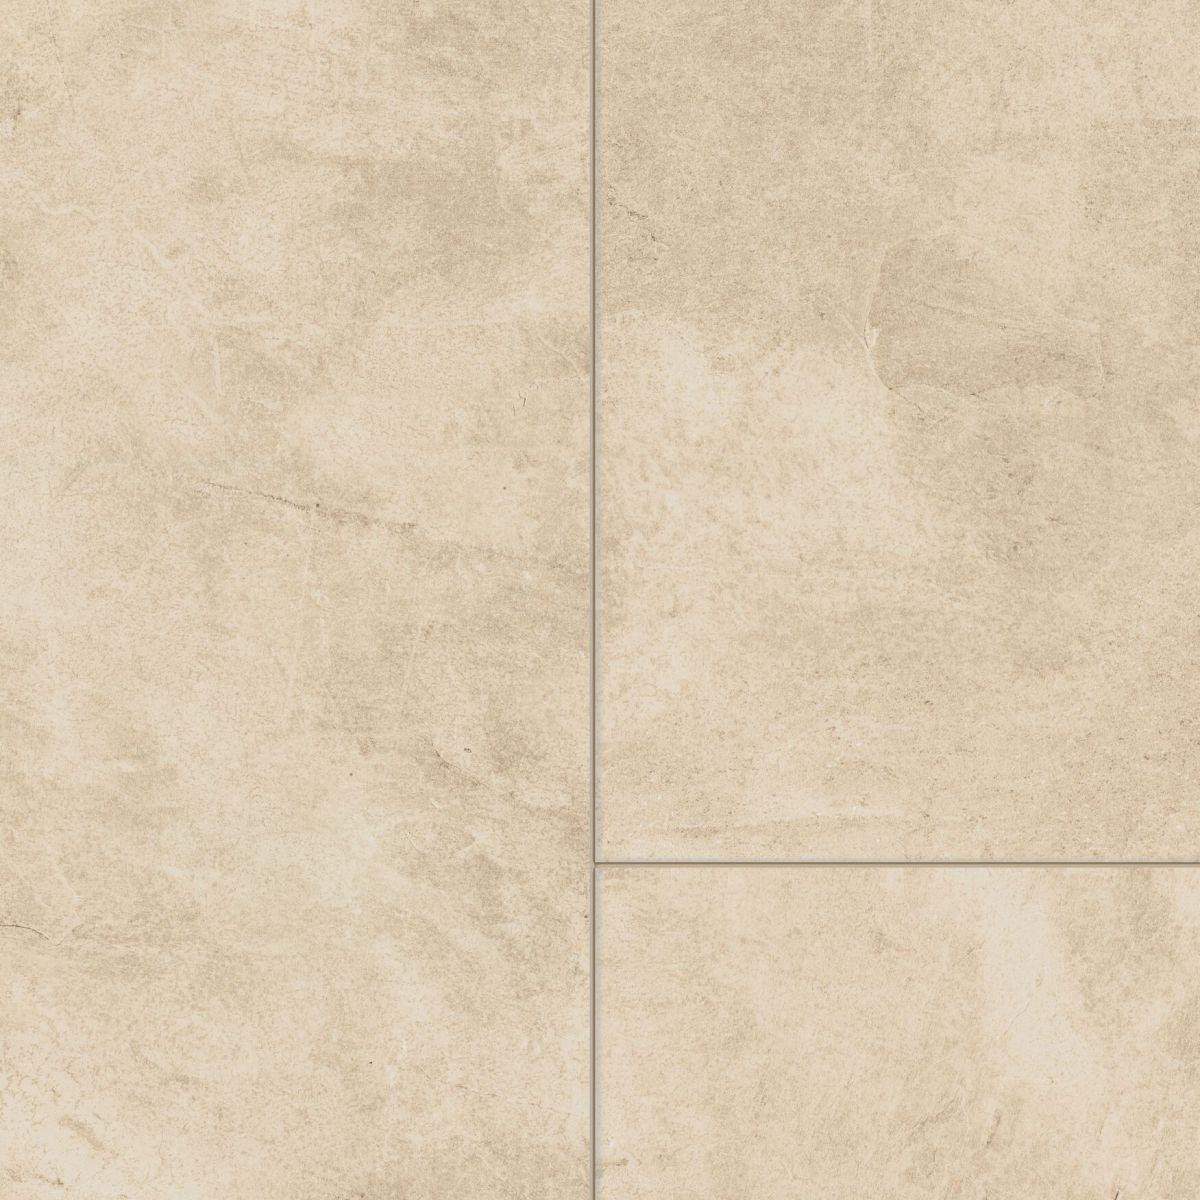 Avatara vloeren steen O5 detail